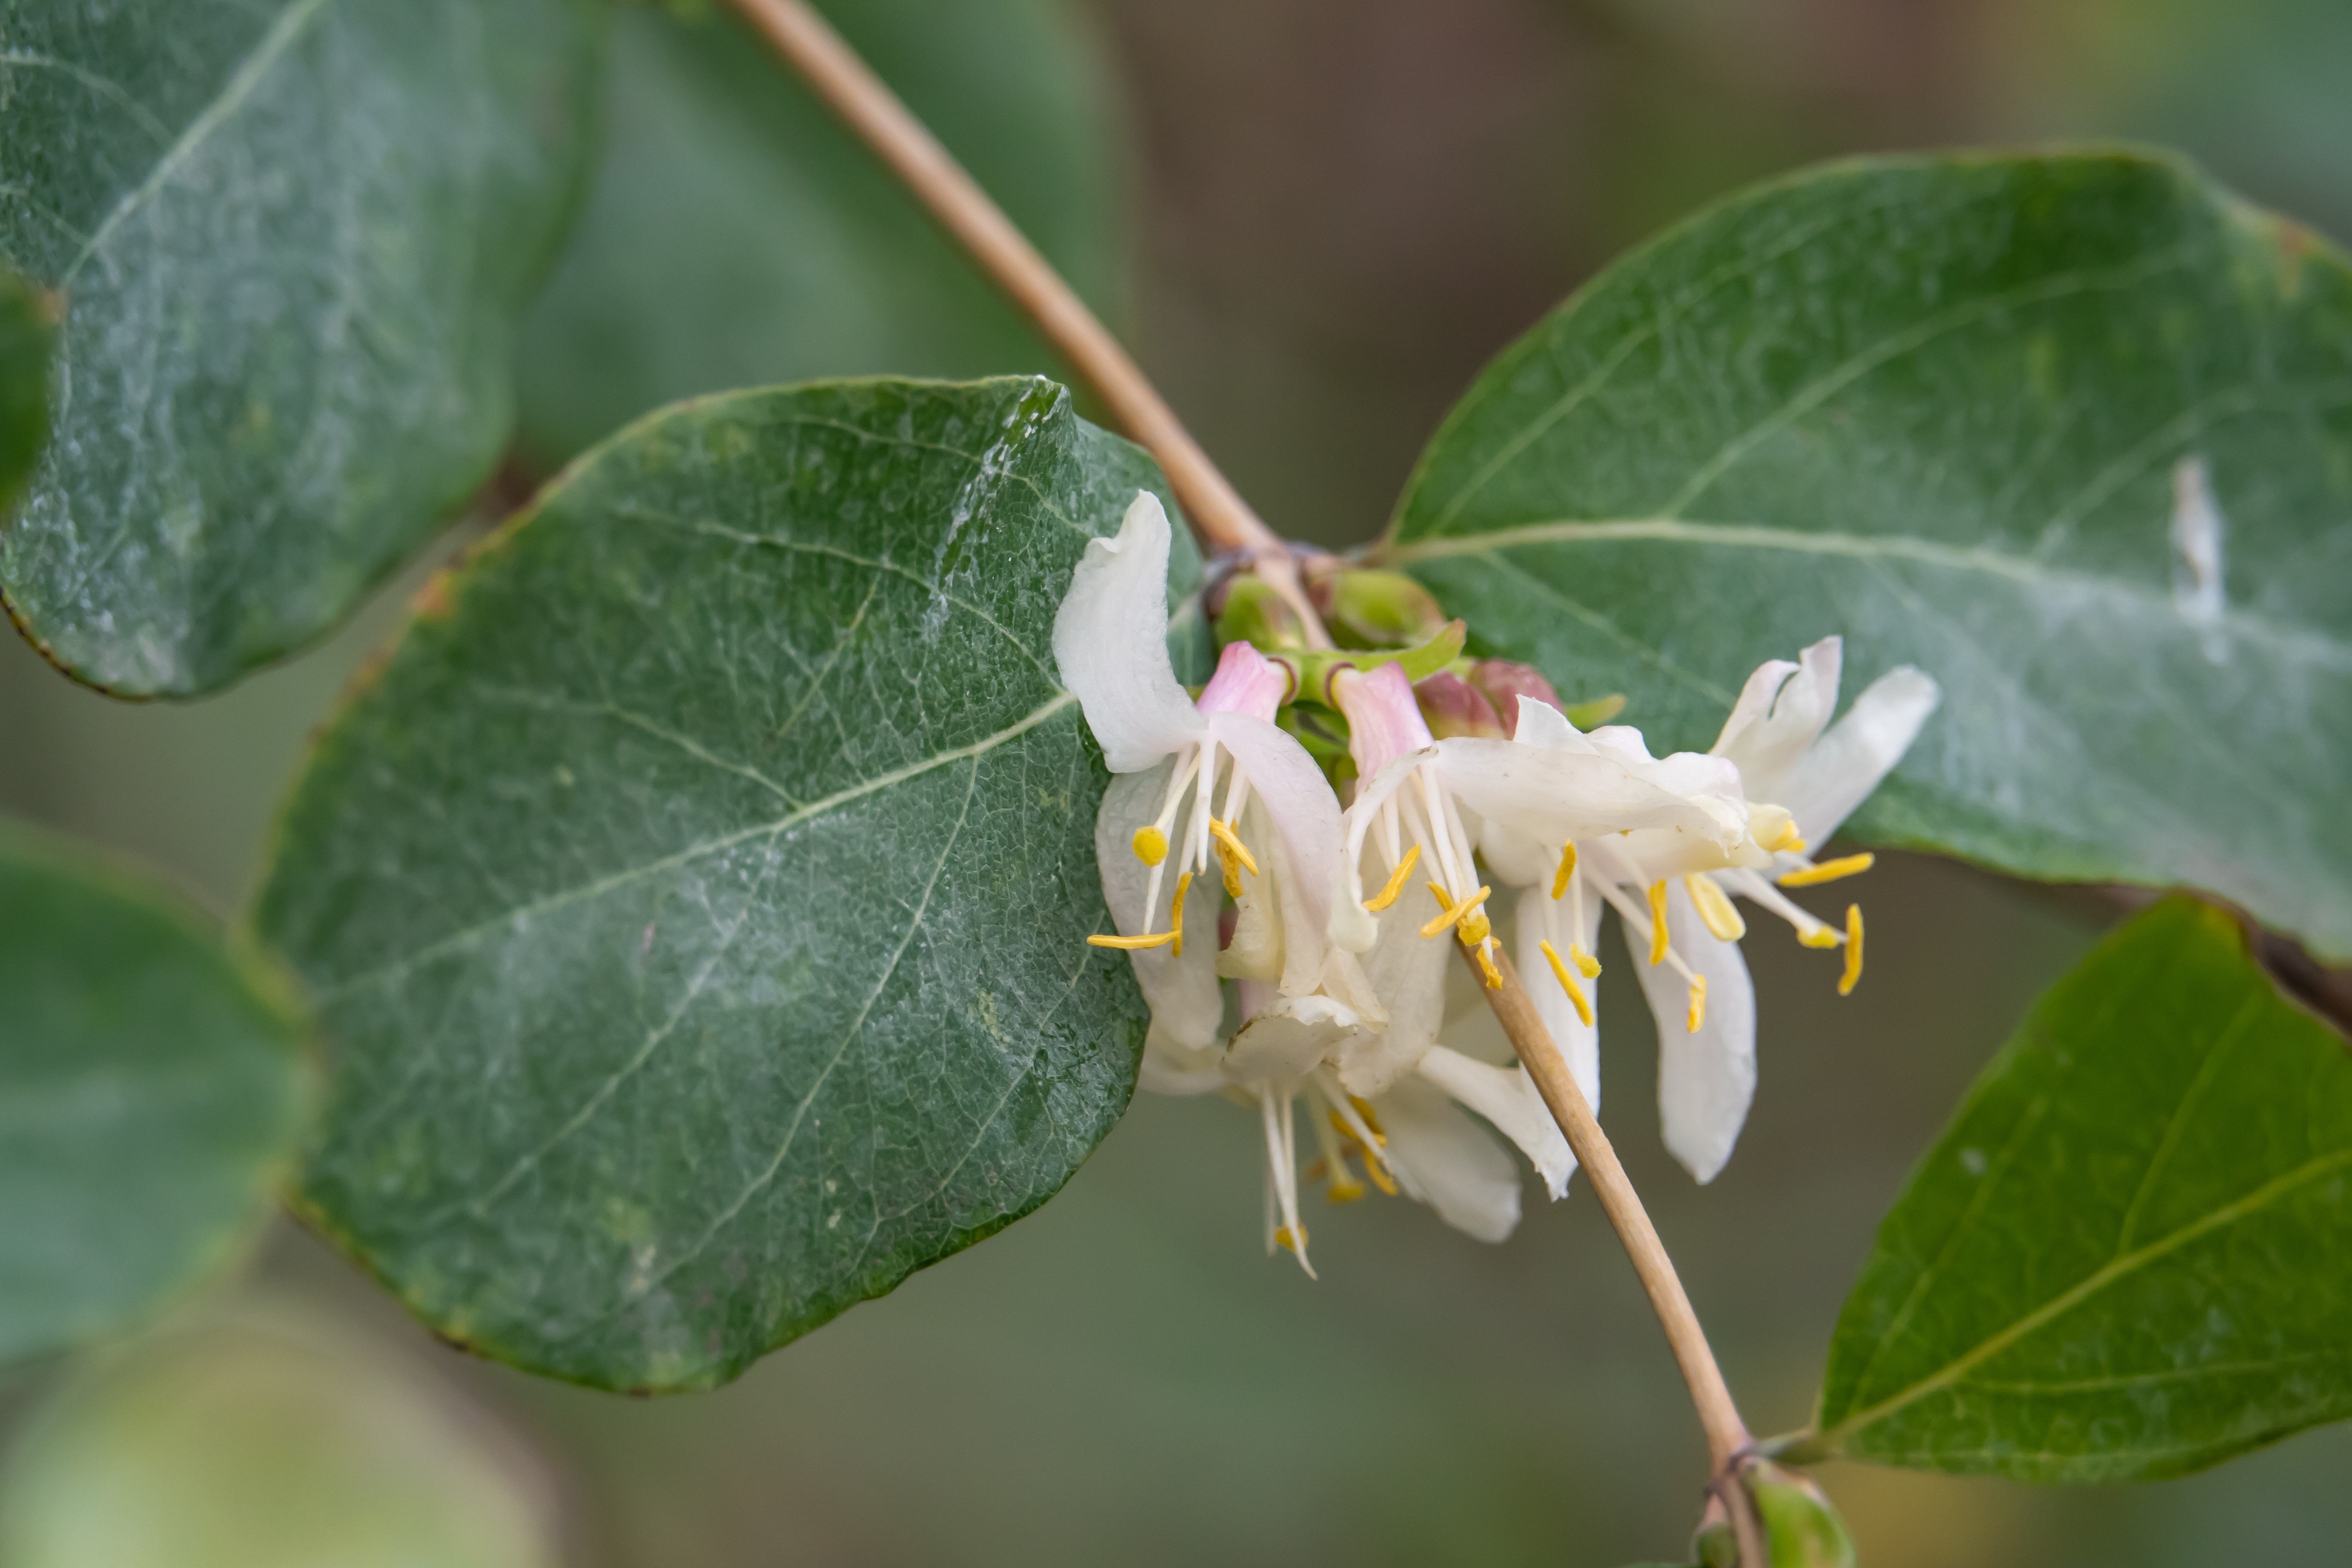 Fragrant Honeysuckle Flowers in Bloom in Winter